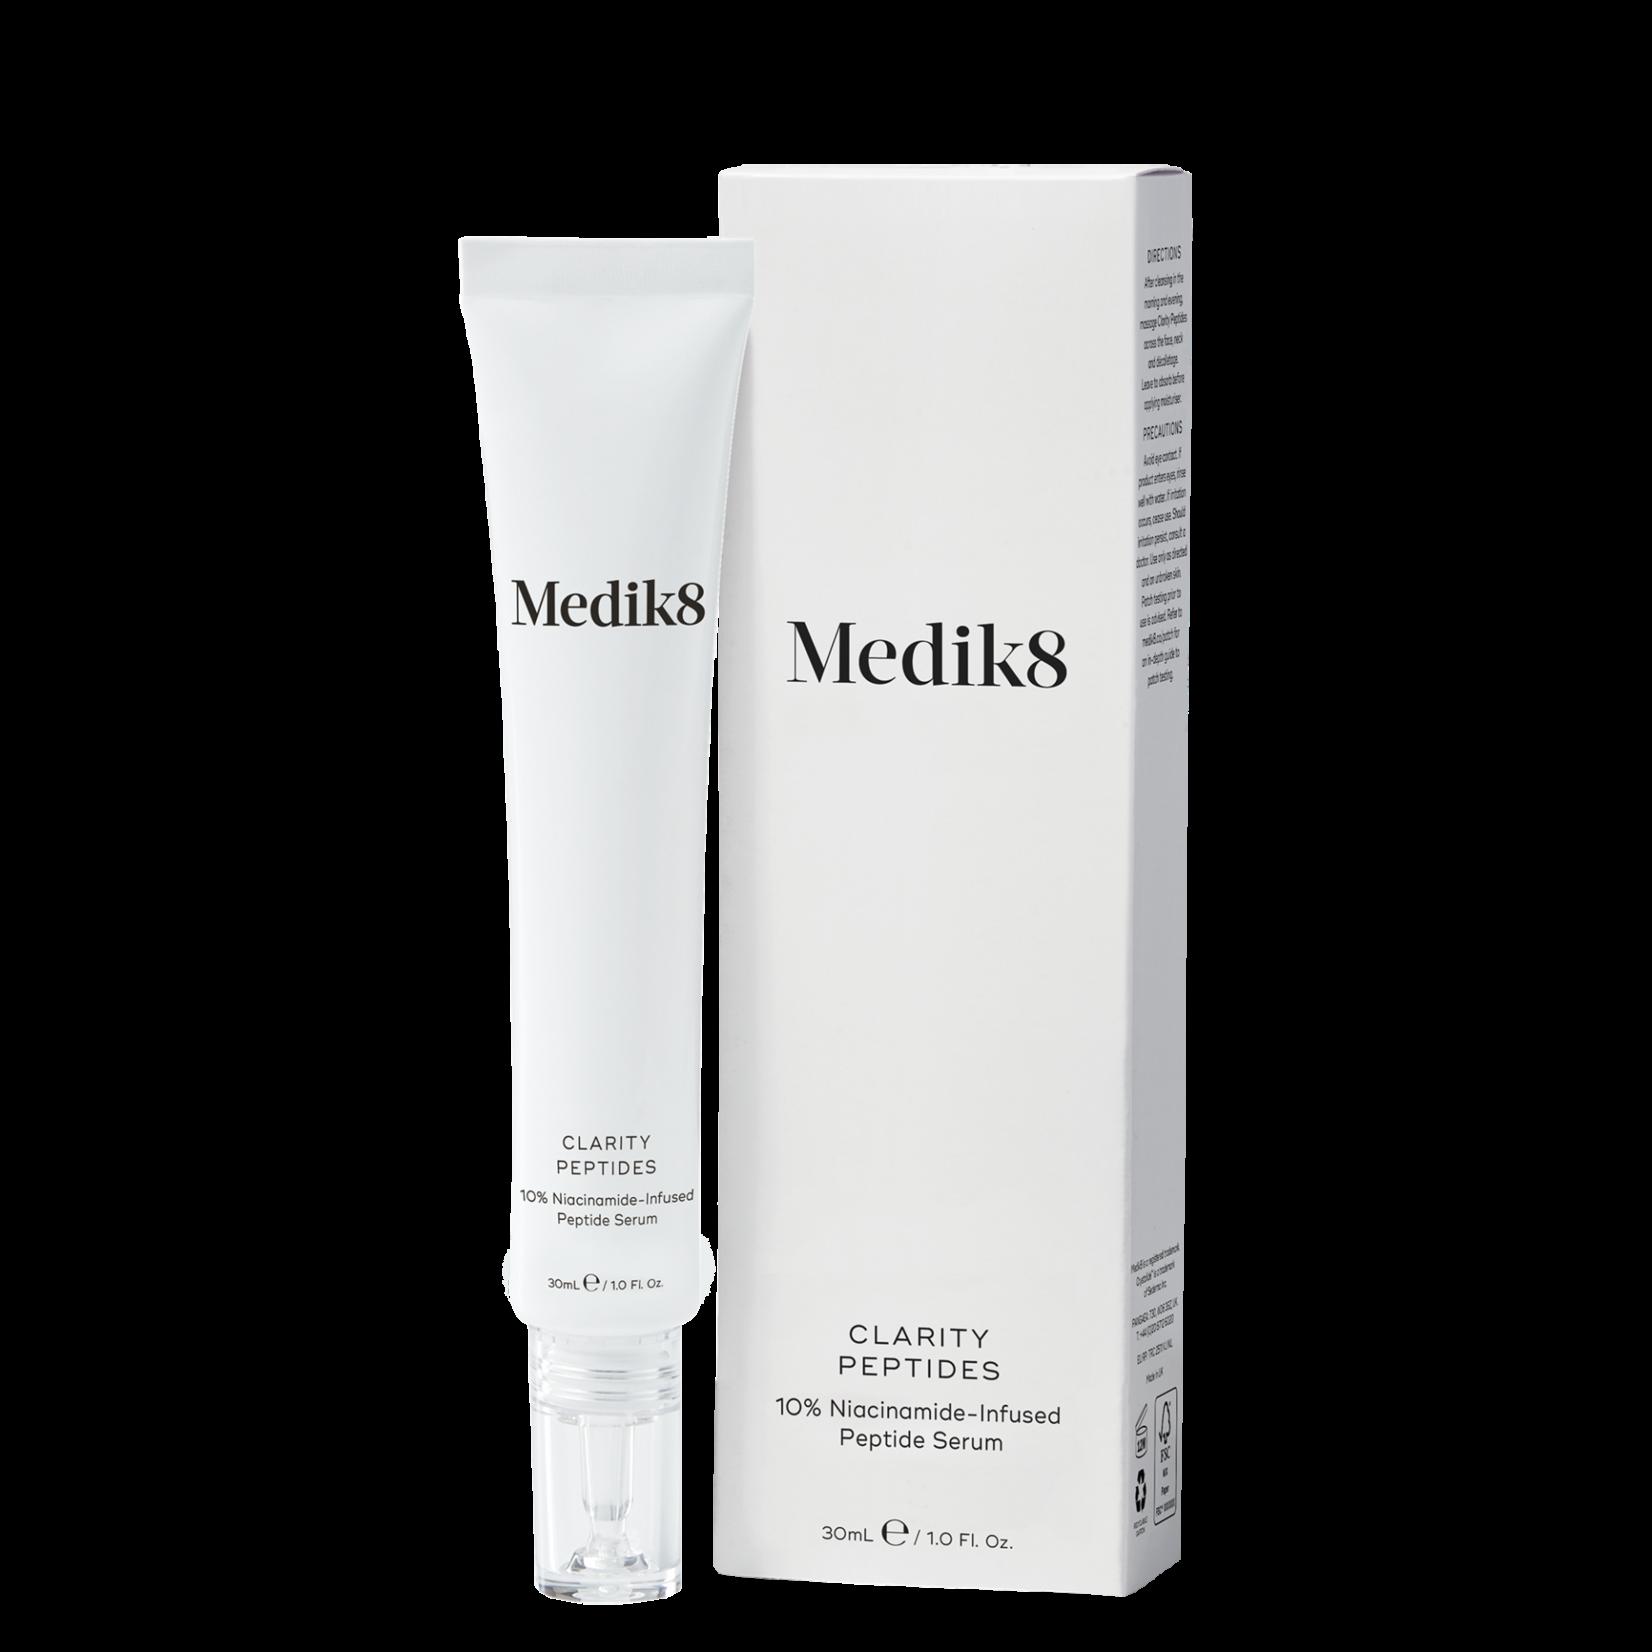 Medik8 Medik8 Clarity Peptides 10% niacinamide serum